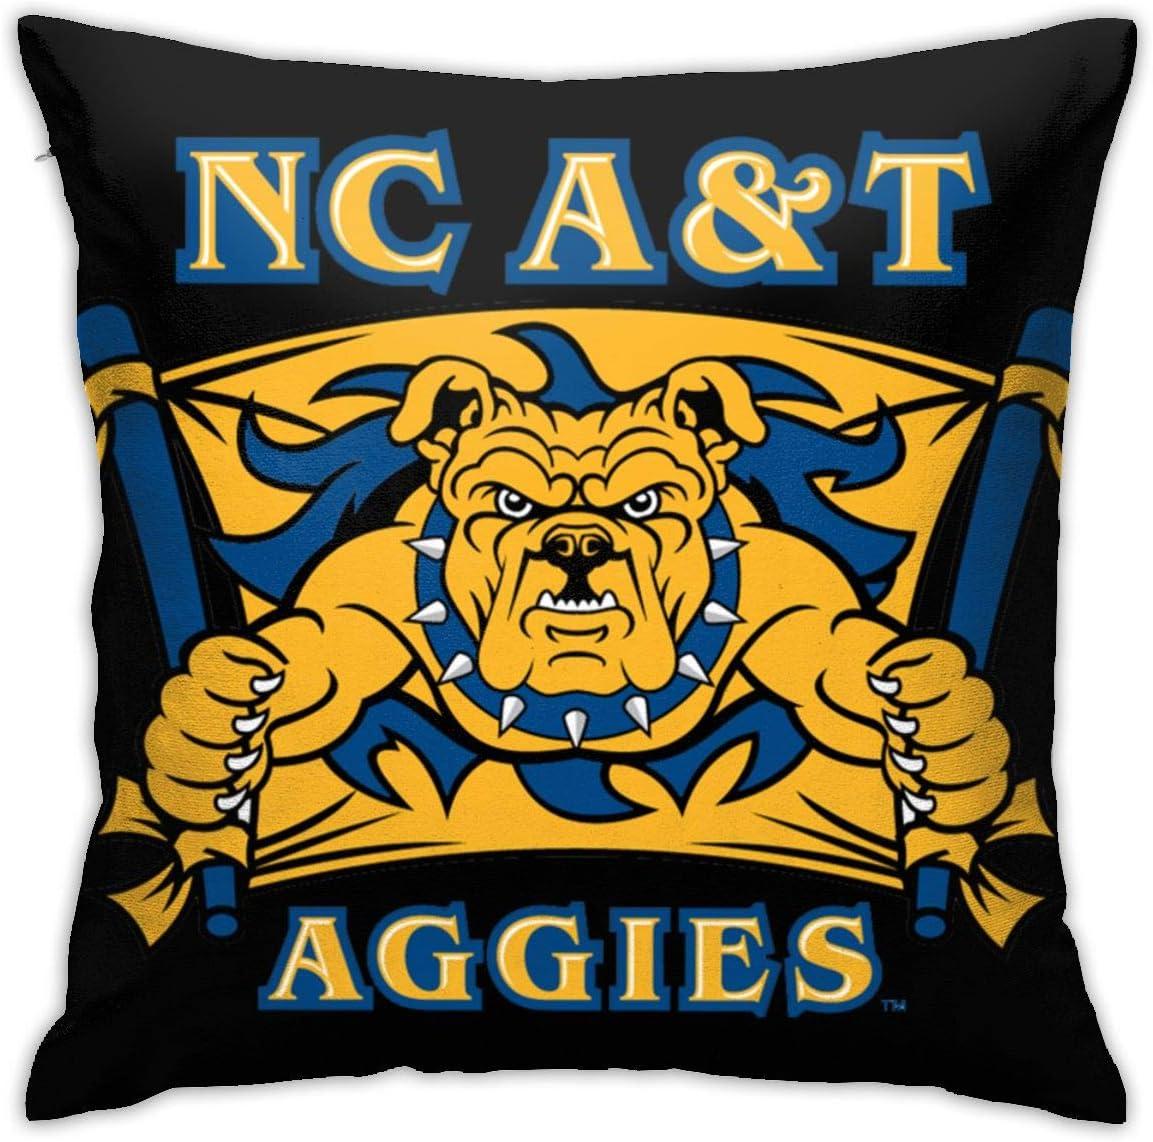 "Nc North Carolina A&T State University Aggies Pillow Covers Decorative Pillowcases Sofa Home Decor 18""X 18""Inch (45 X 45cm)"